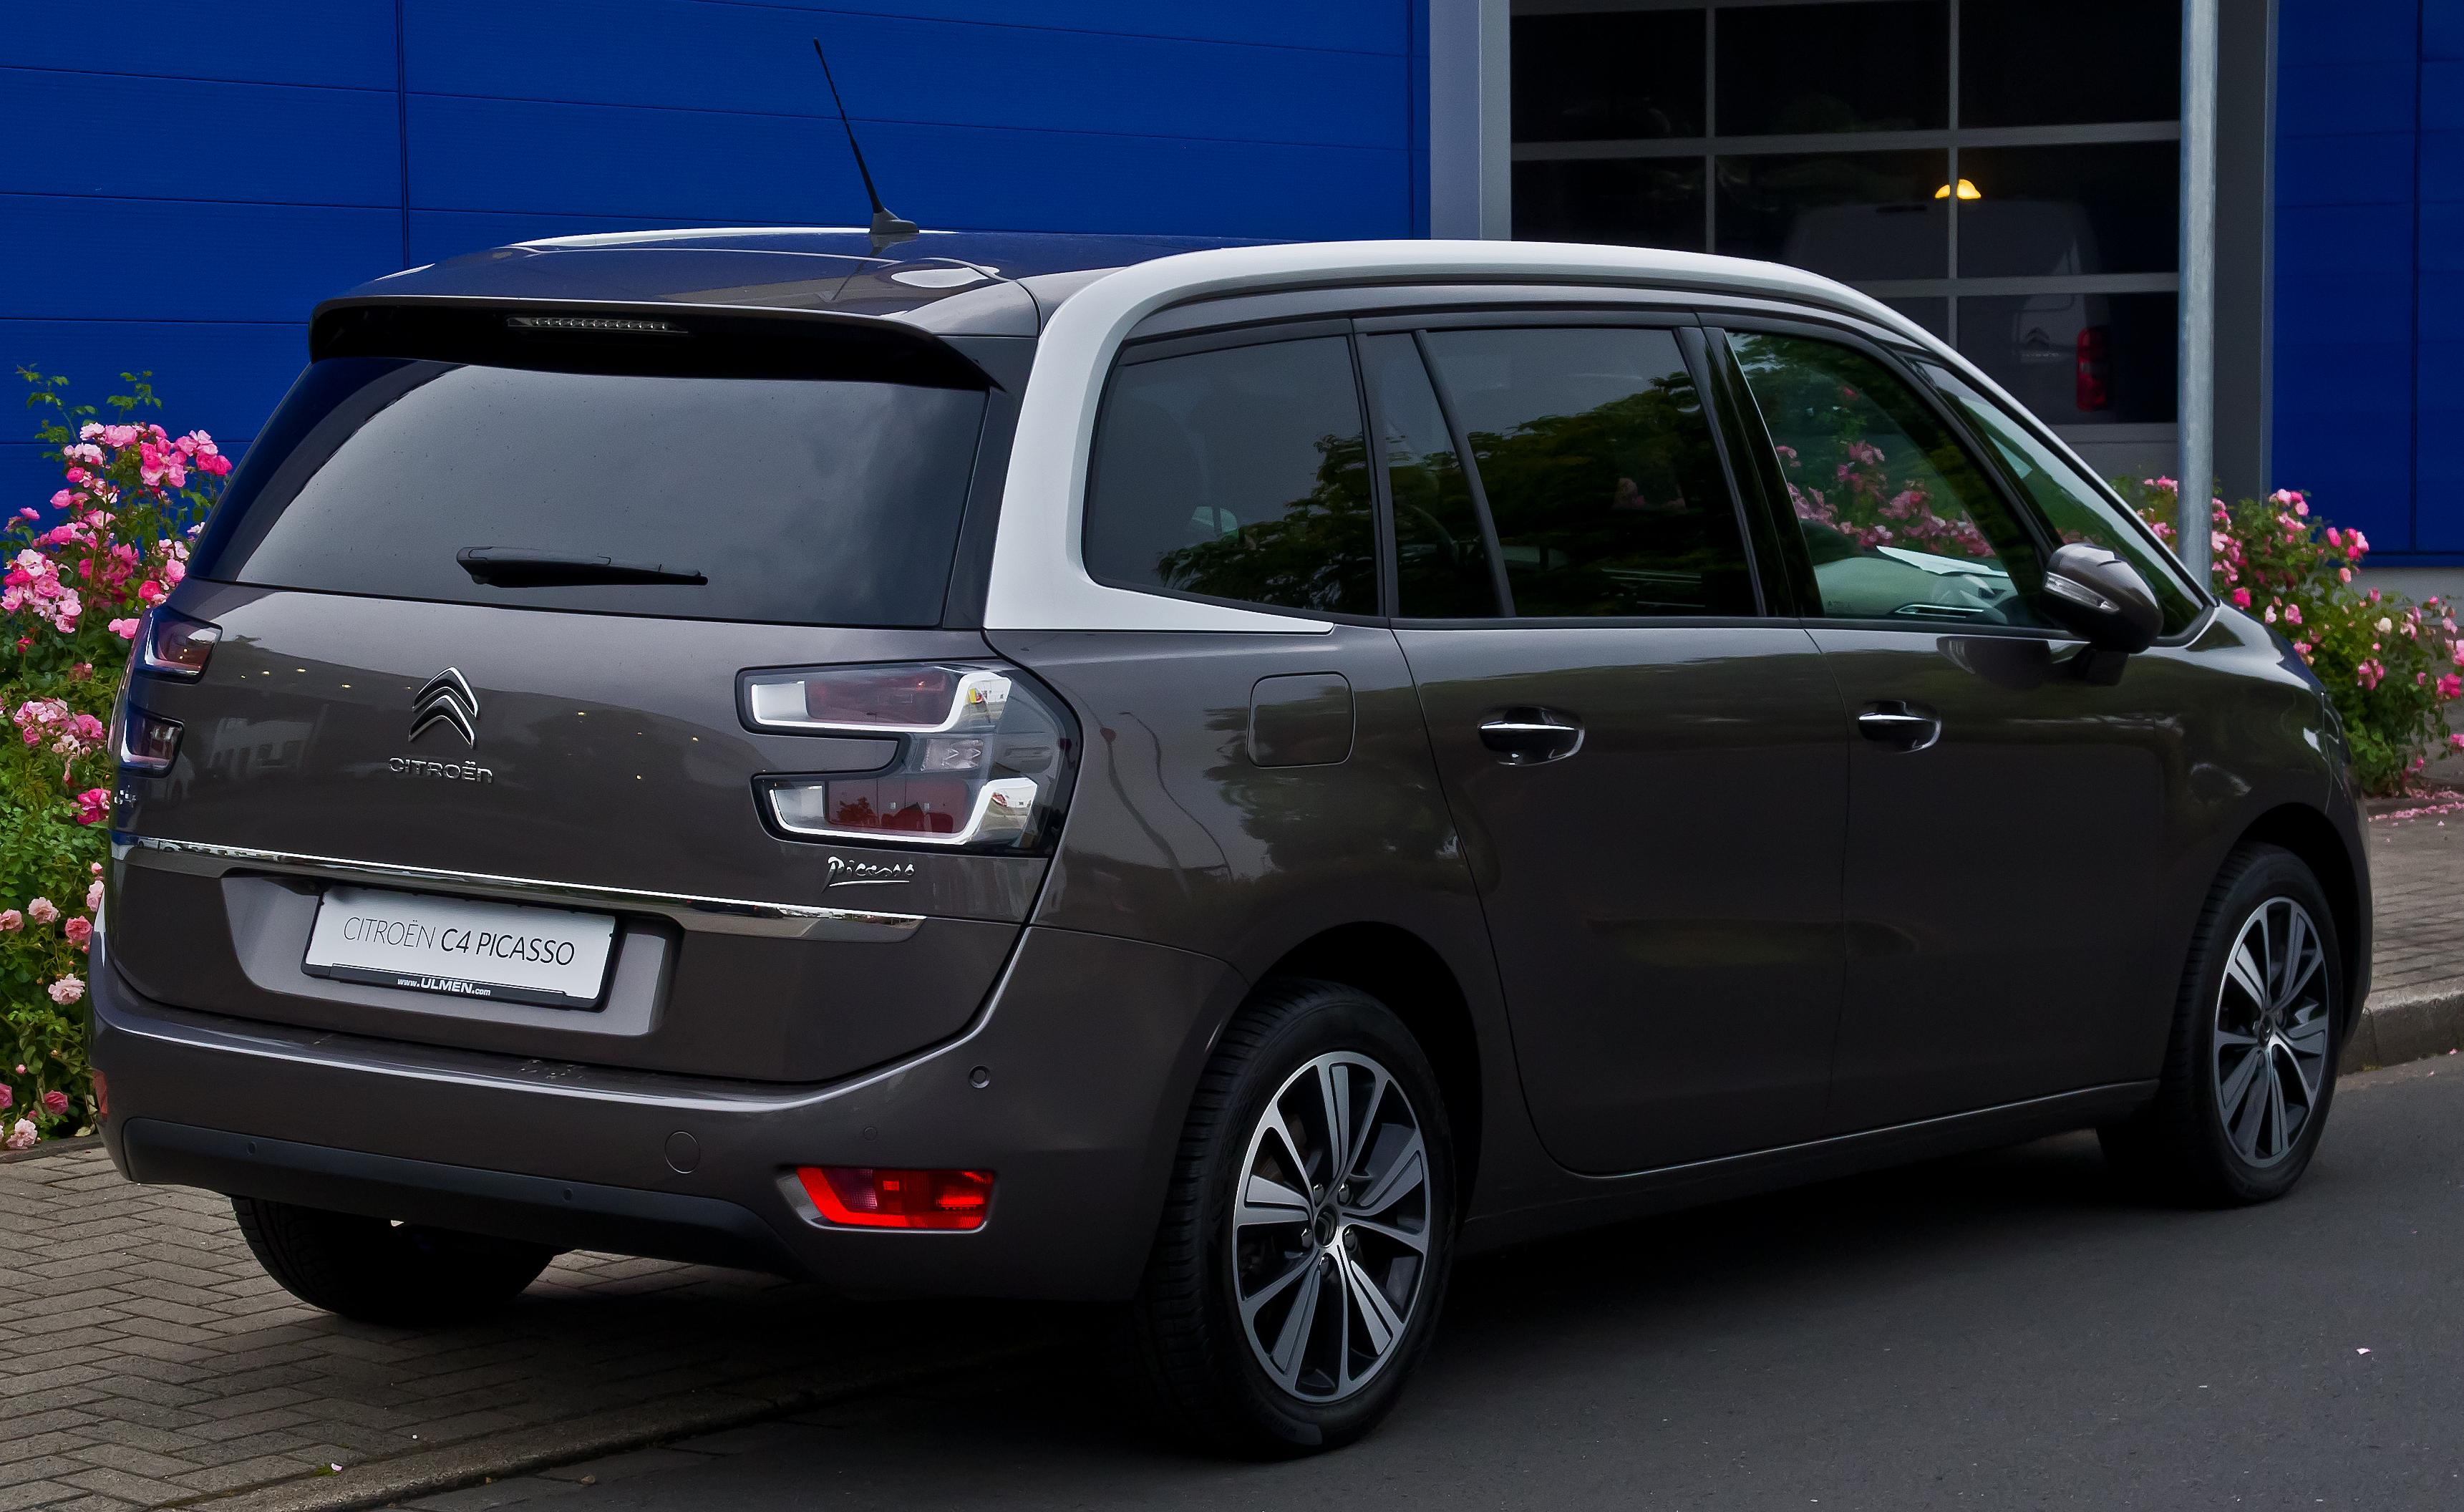 File:Citroën Grand C4 Picasso (II, Facelift) - Heckansicht ...